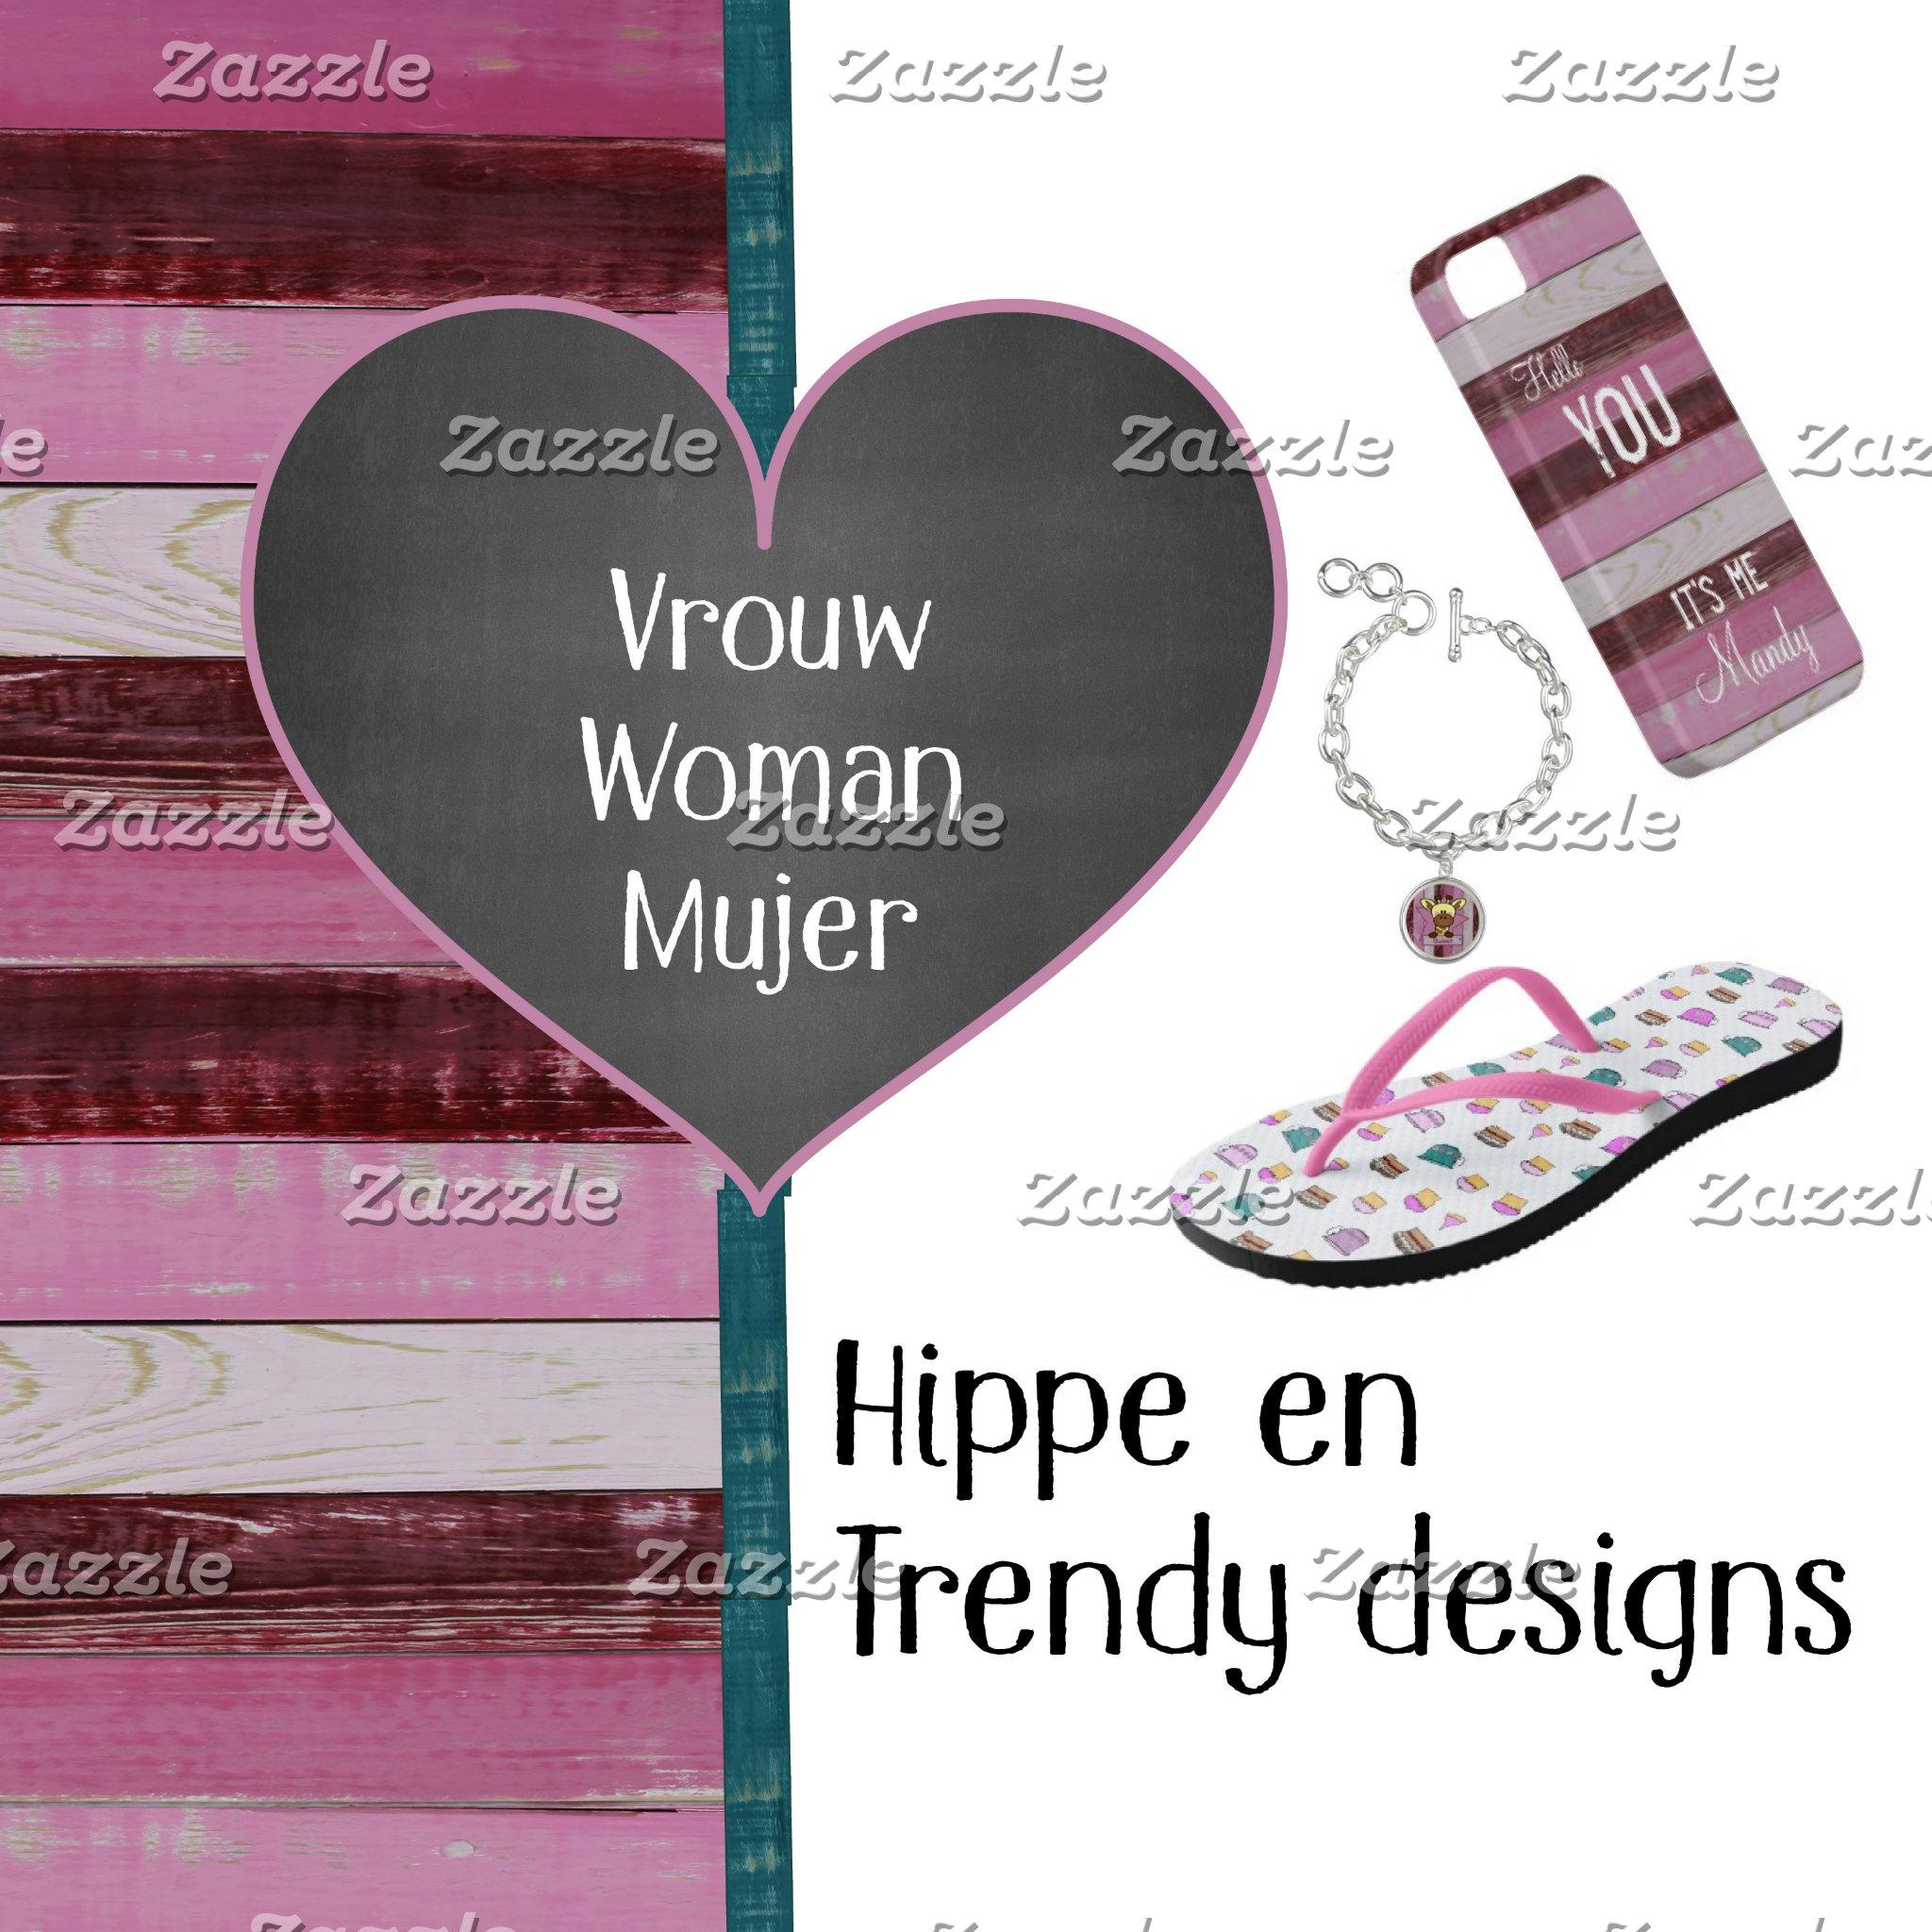 Hippe en trendy designs